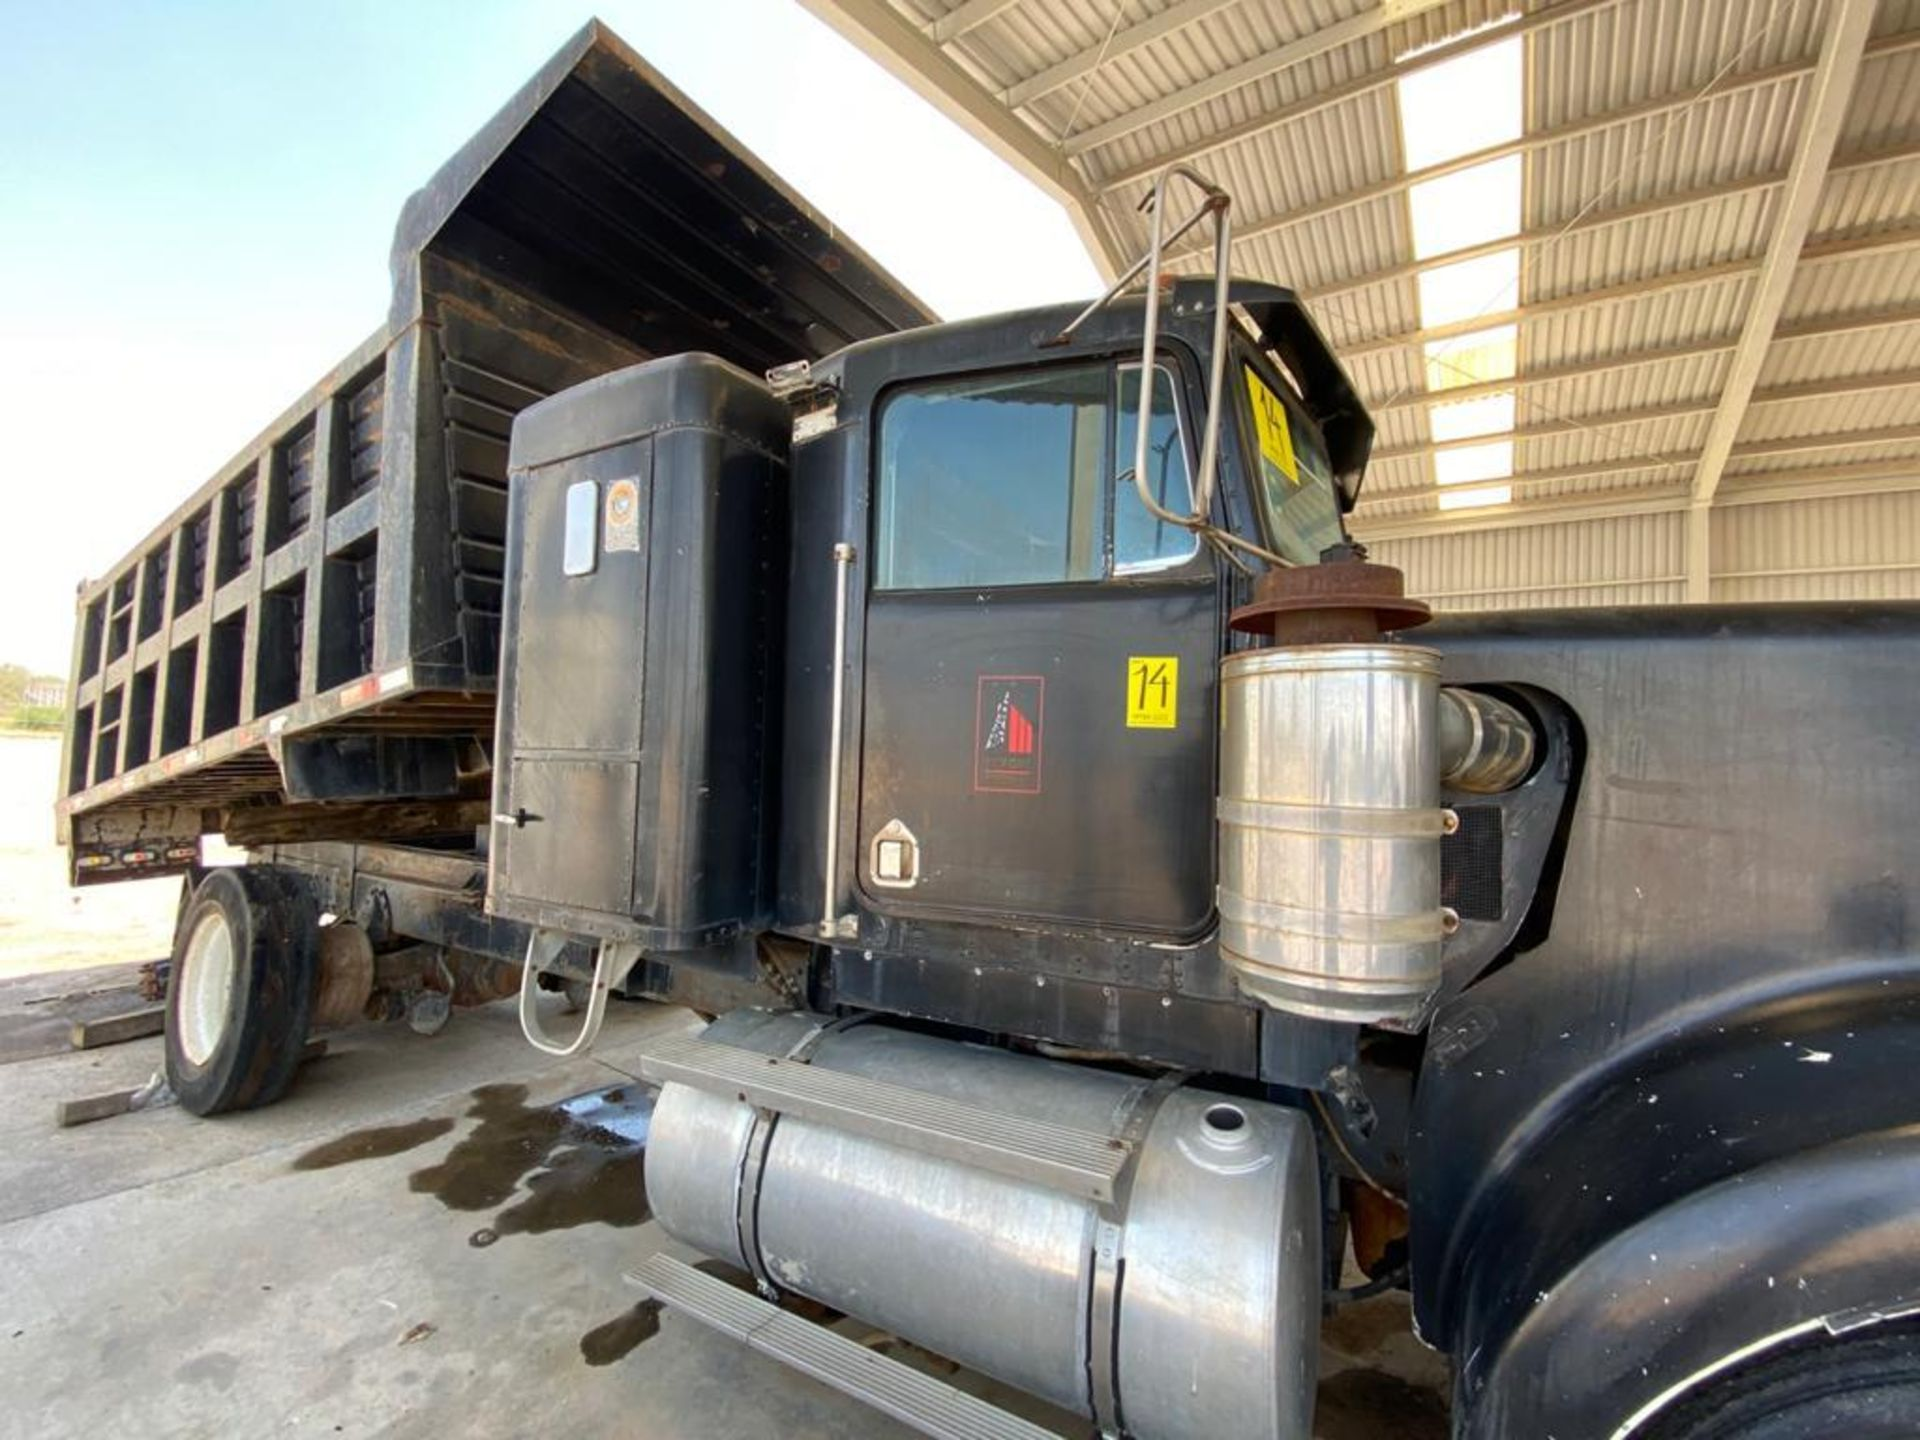 1983 Kenworth Dump Truck, standard transmission of 10 speeds, with Cummins motor - Image 16 of 68